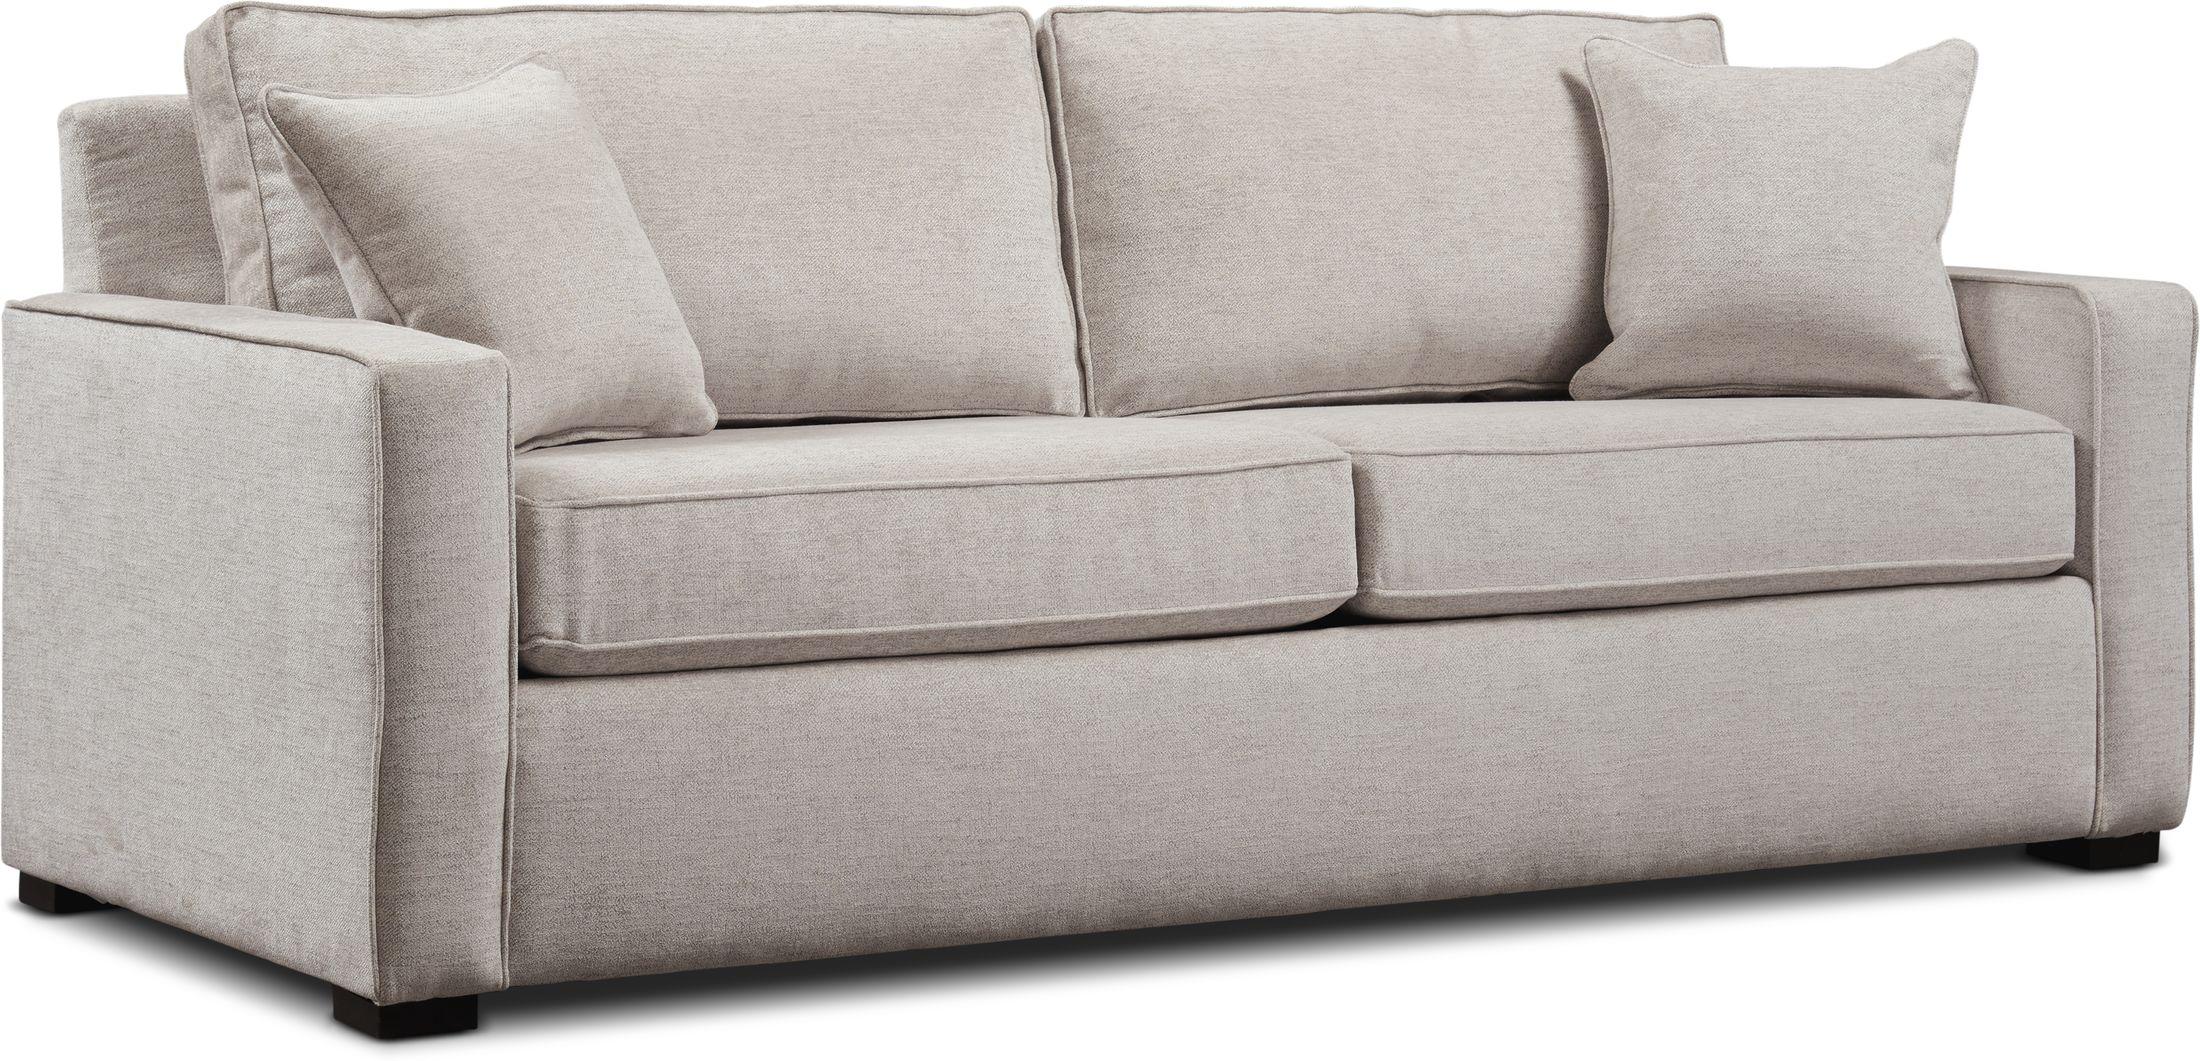 "Living Room Furniture - Mayson 88"" Sofa"